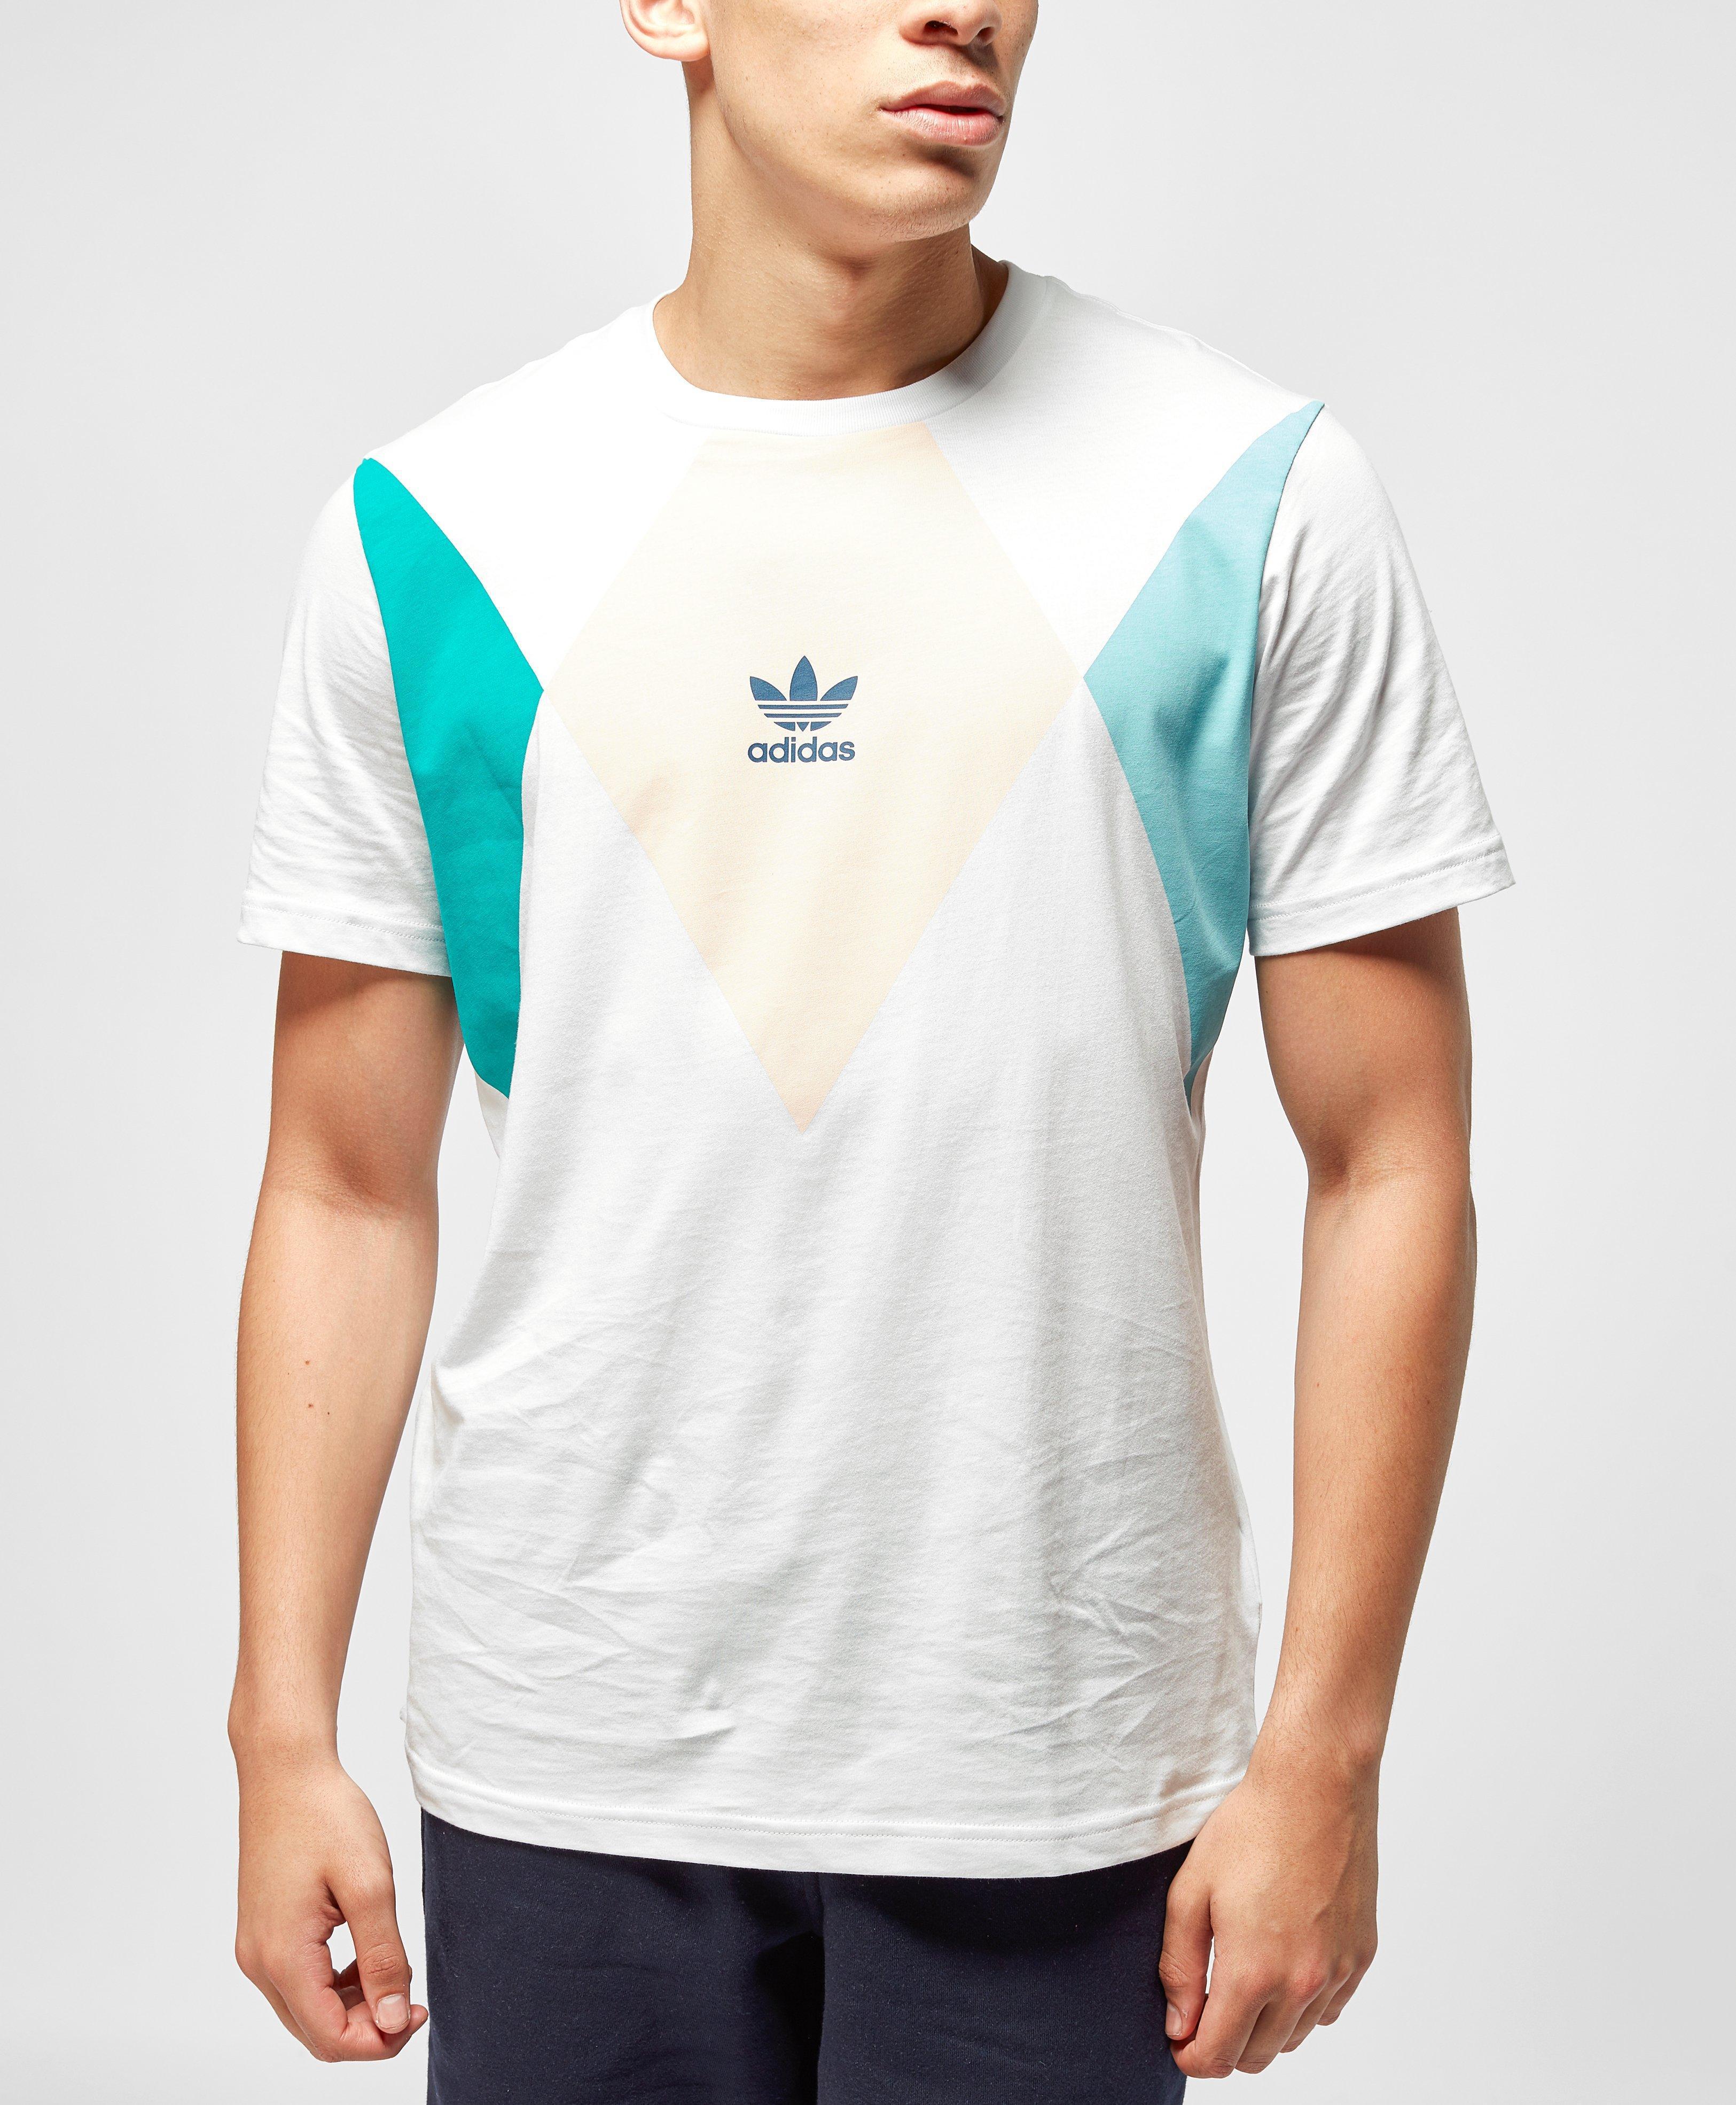 85dcb2af2 Adidas Originals Tennis Crew Neck T-shirt for Men - Lyst